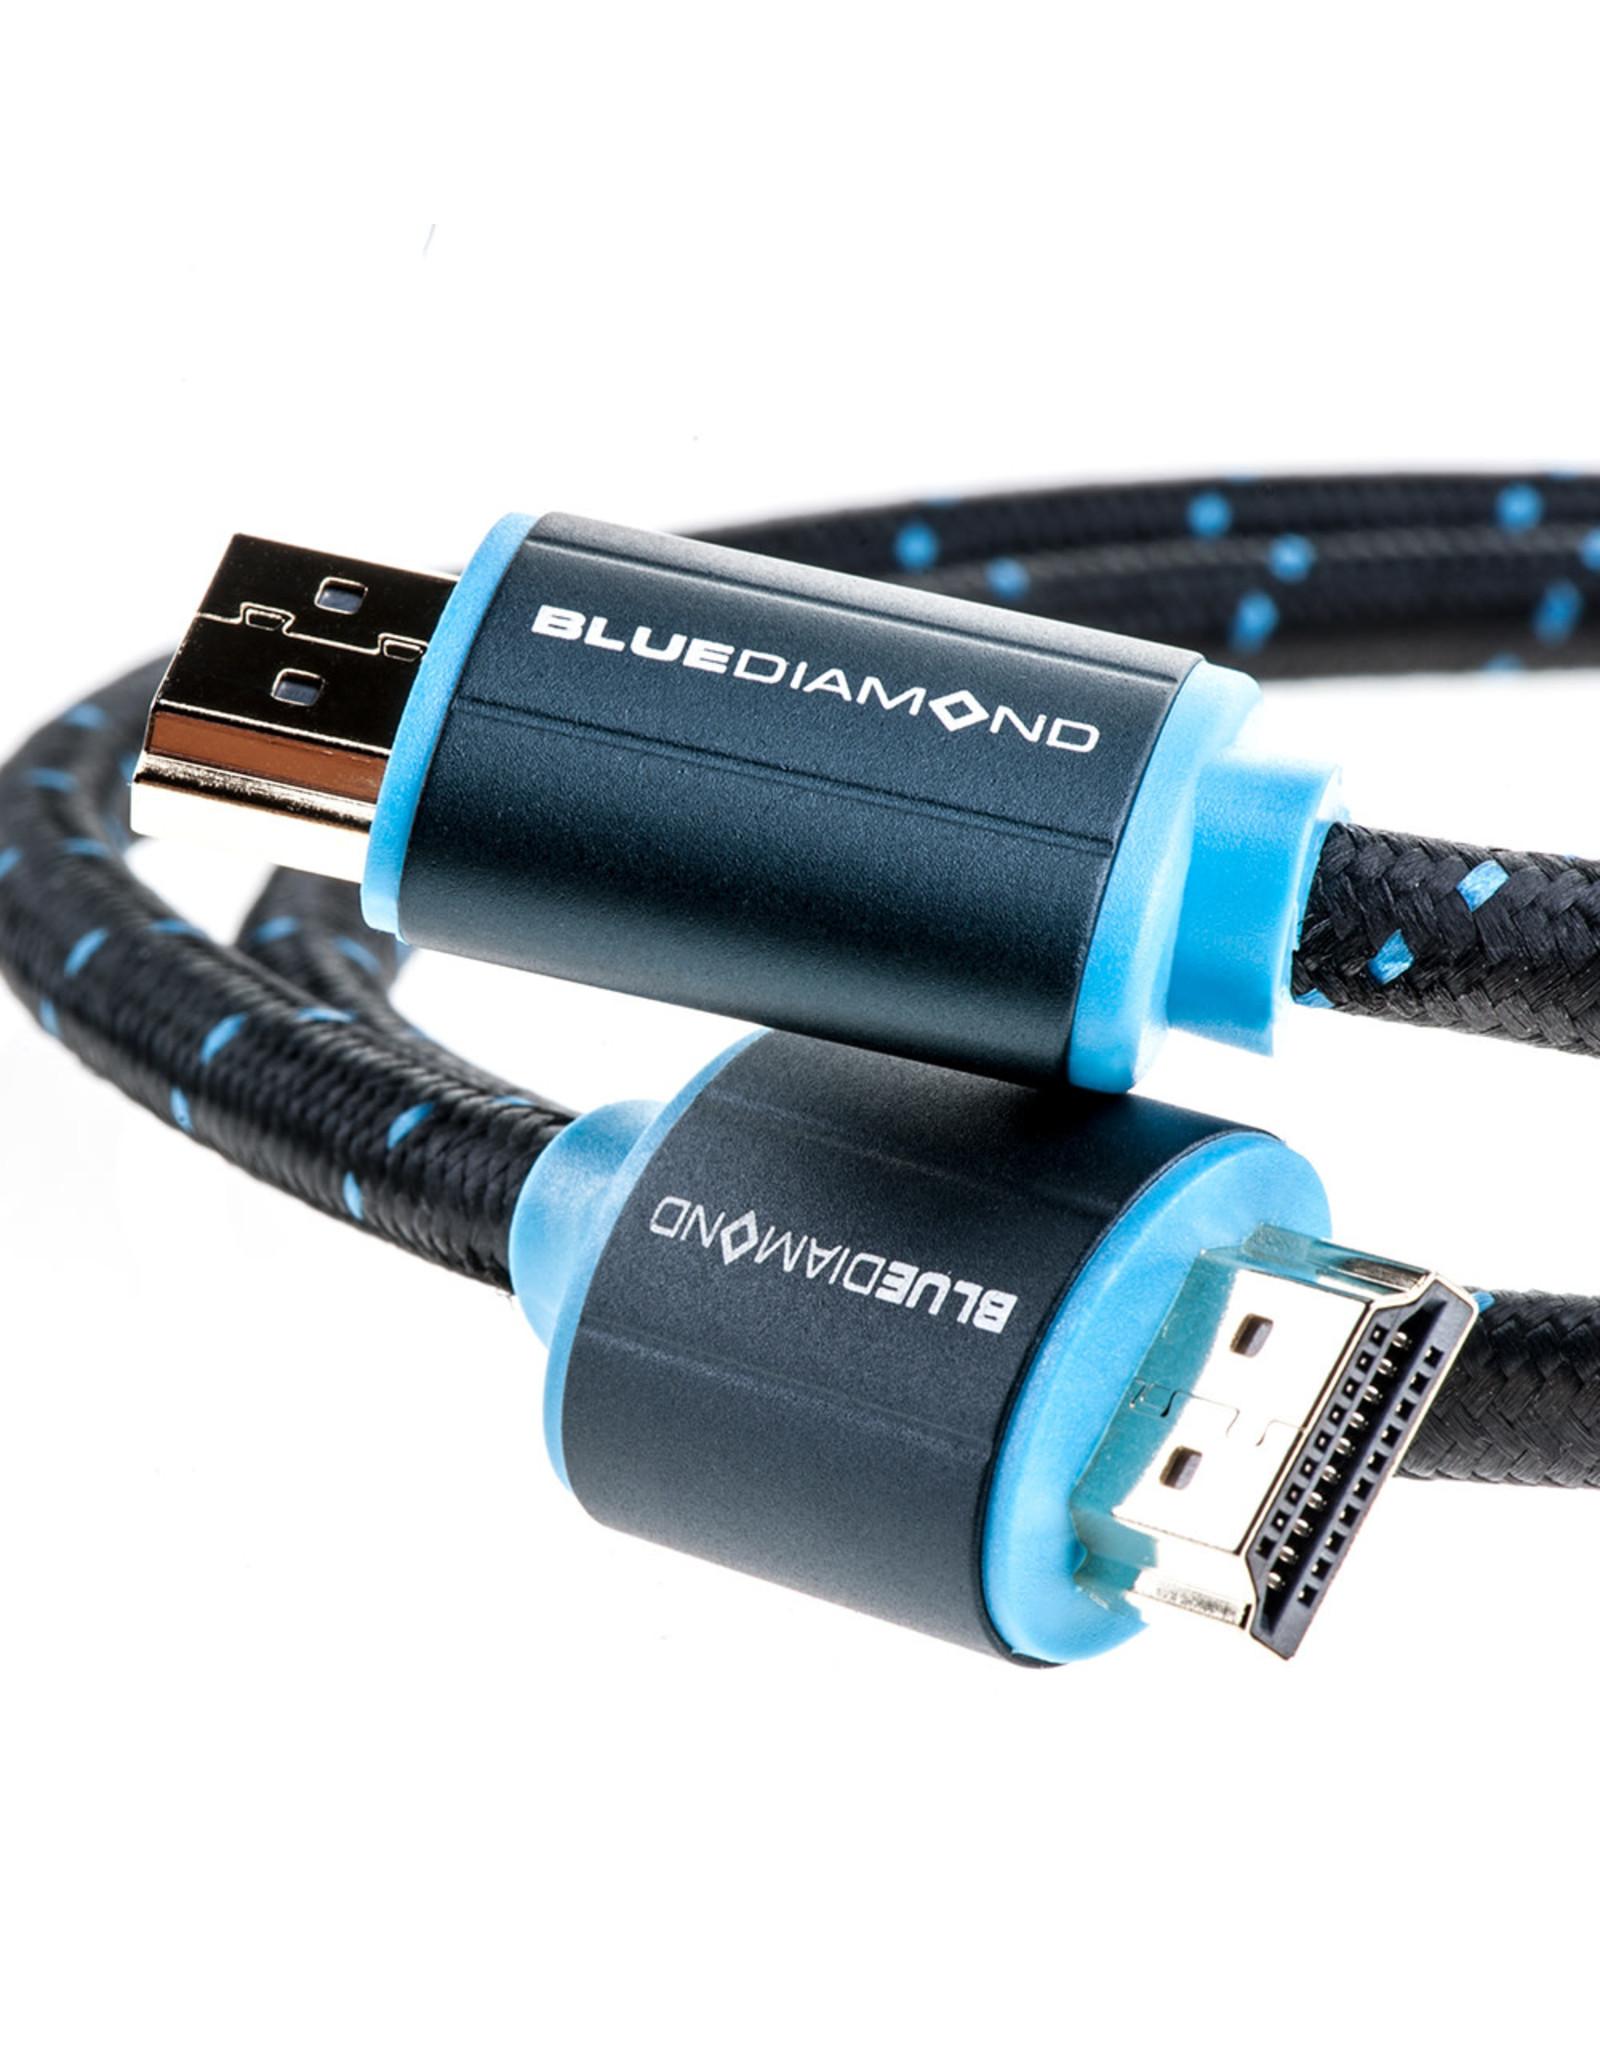 BlueDiamond BlueDiamond Premium HDMI 4k UltraHD Cable, 3ft